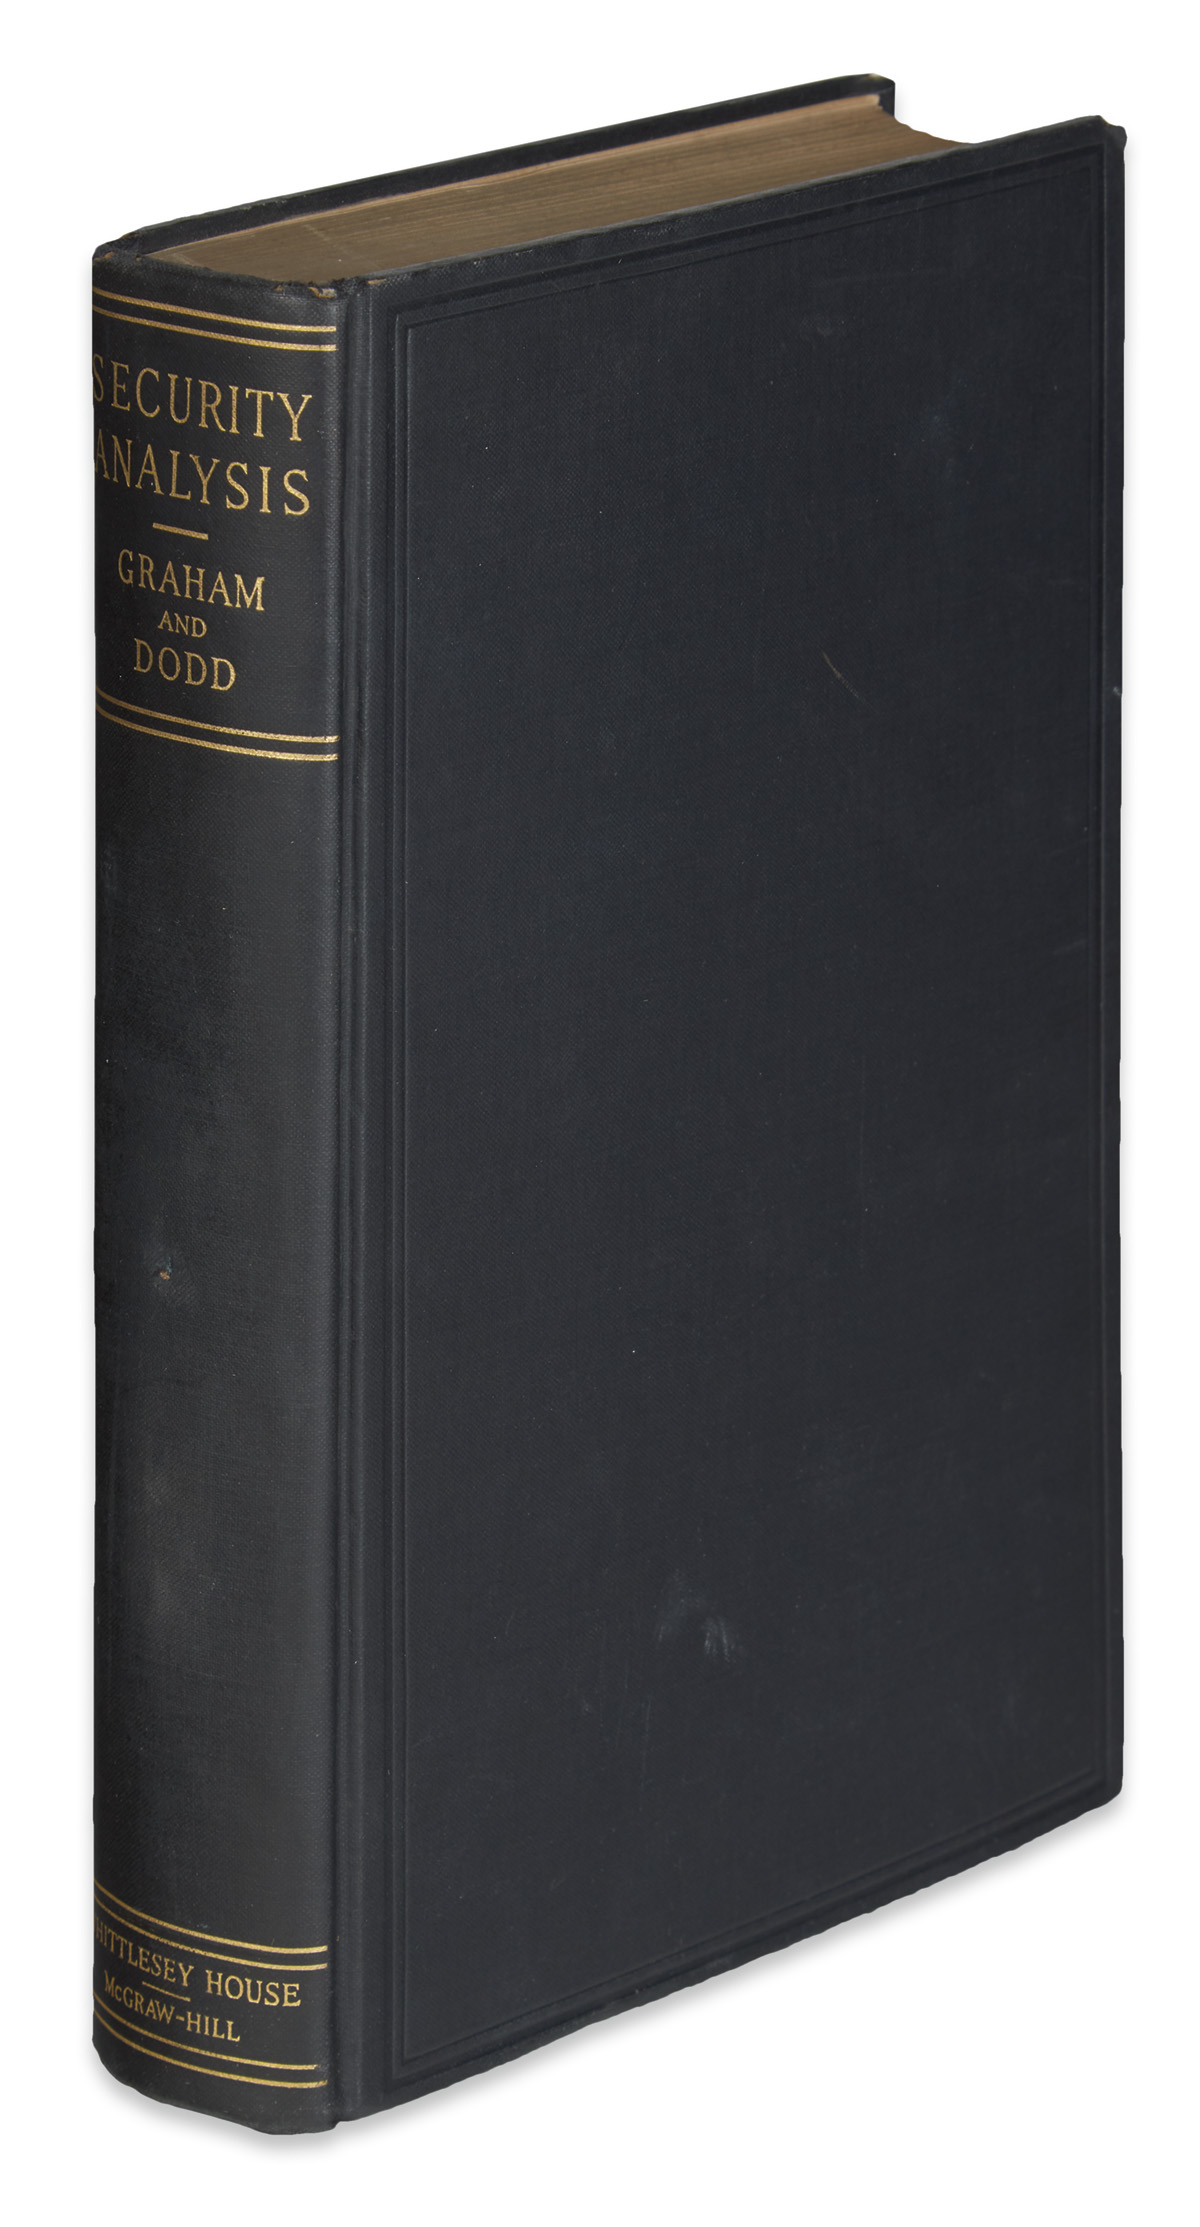 (ECONOMICS)-Graham-Benjamin;-and-Dodd-David-L-Security-Analy